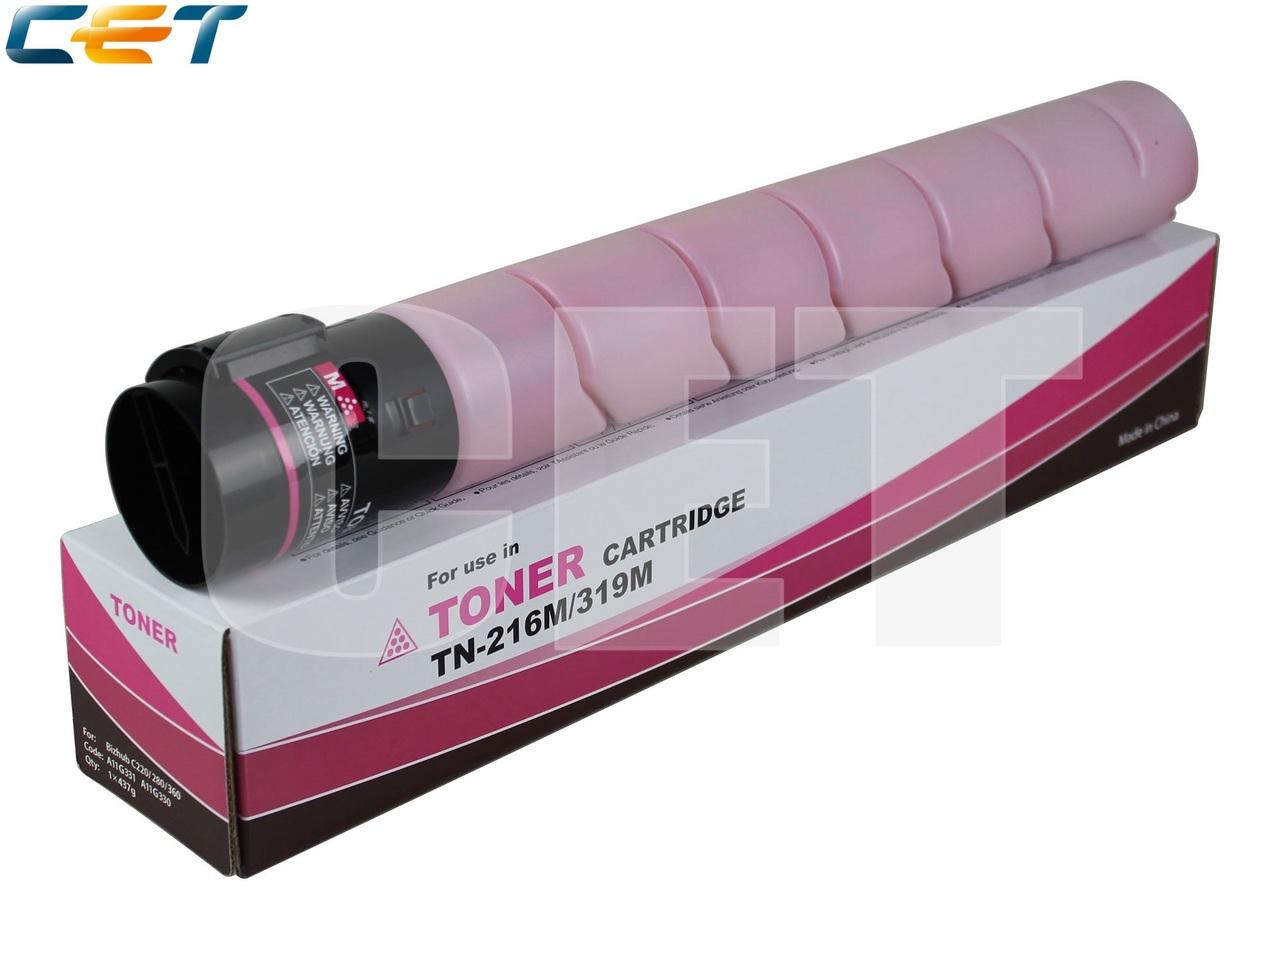 Тонер-картридж (NF5) TN-216M/319M для KONICA MINOLTABizhub C220/C280/C360 (CET) Magenta, 437г, 26000 стр.,CET6841